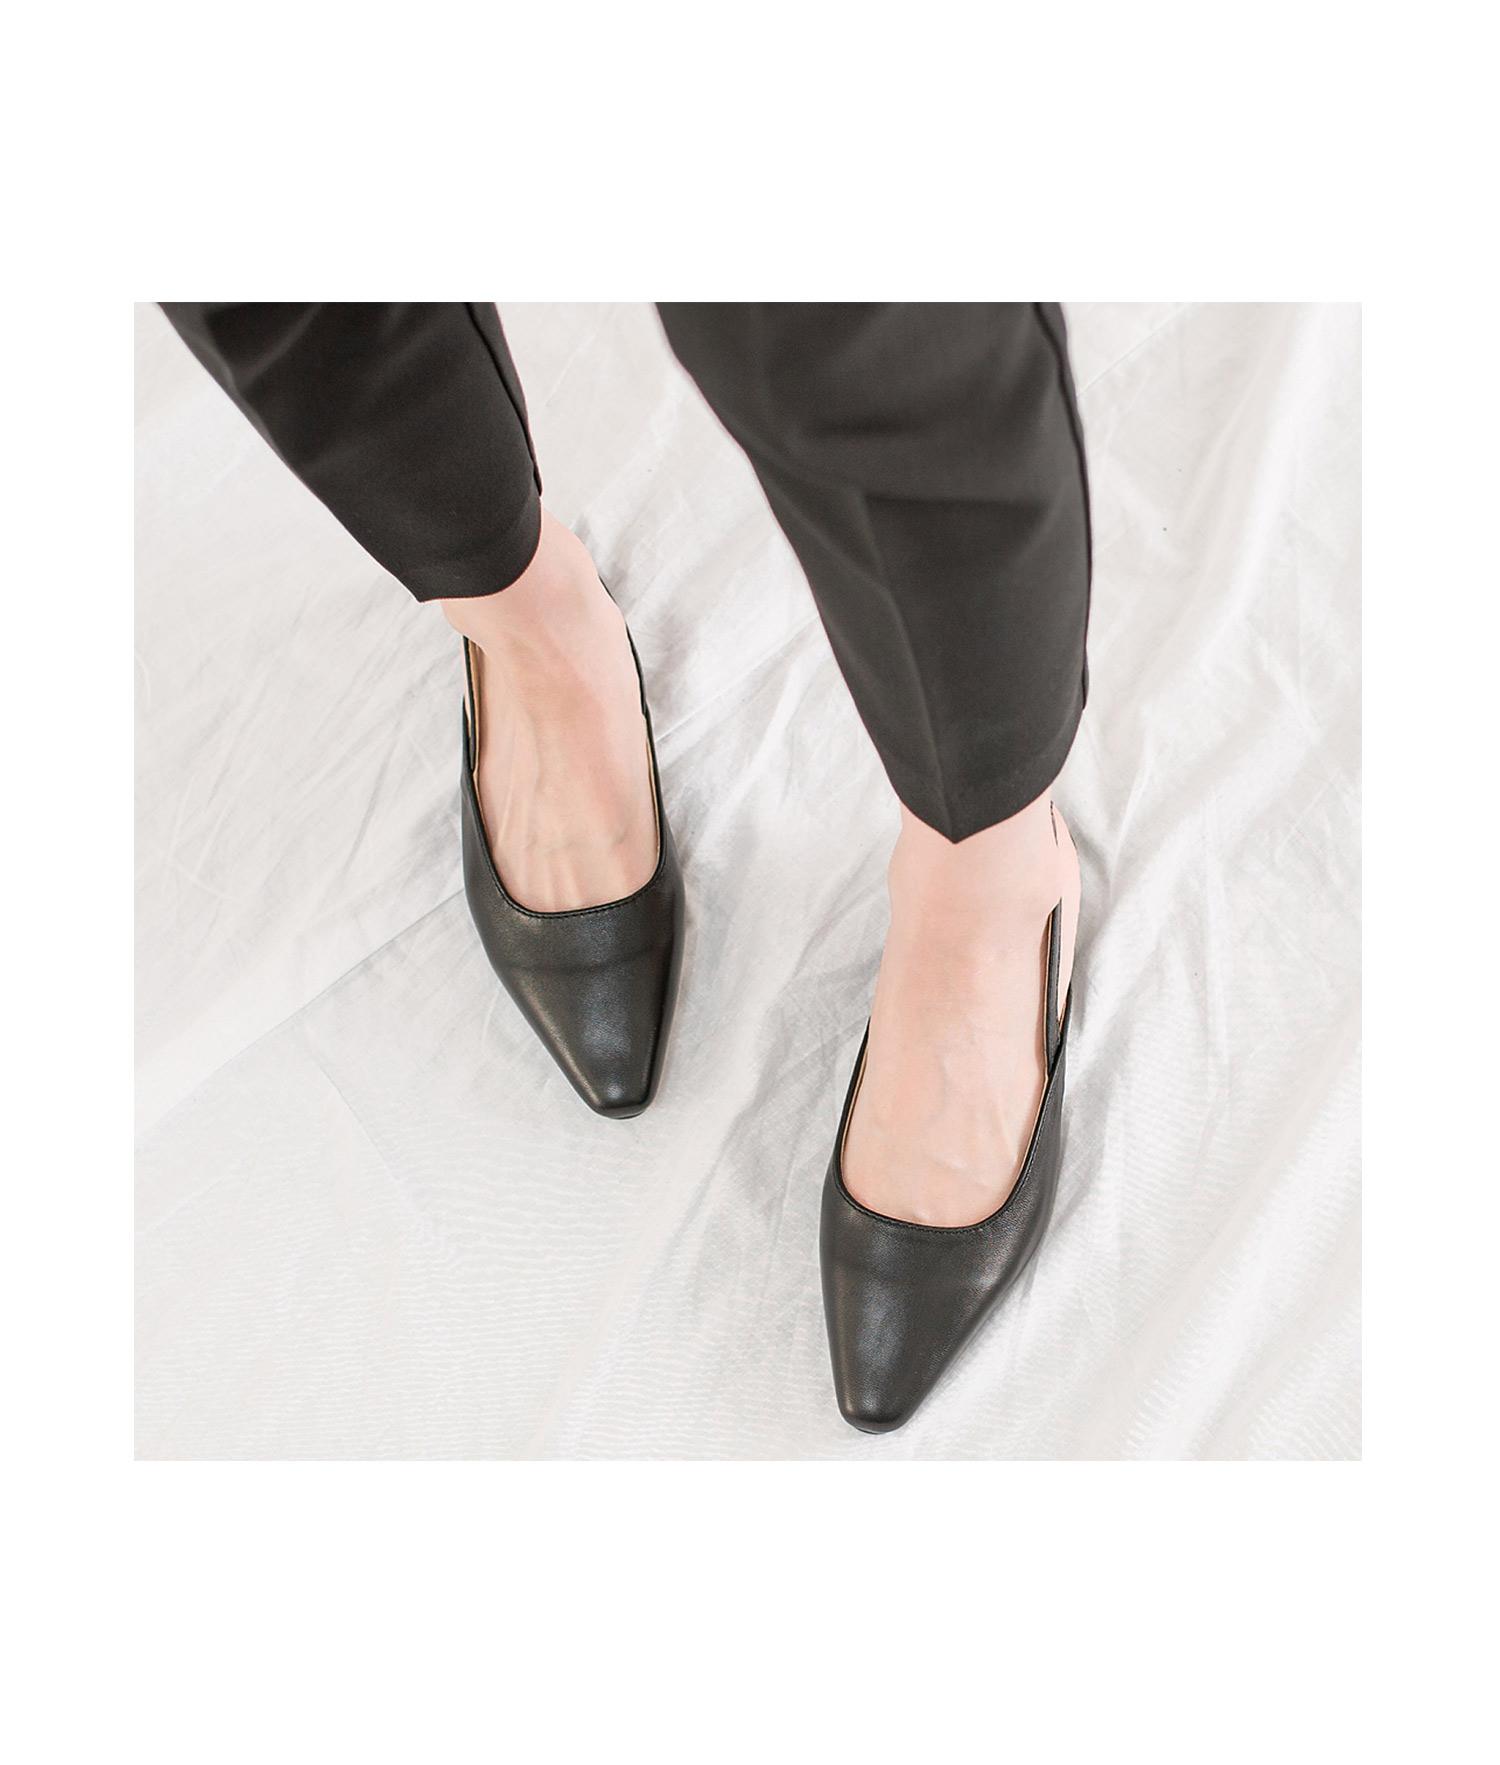 5677314e094c0 AnnaKastle Womens Pointy Toe Low Heel Slingback Pumps Black